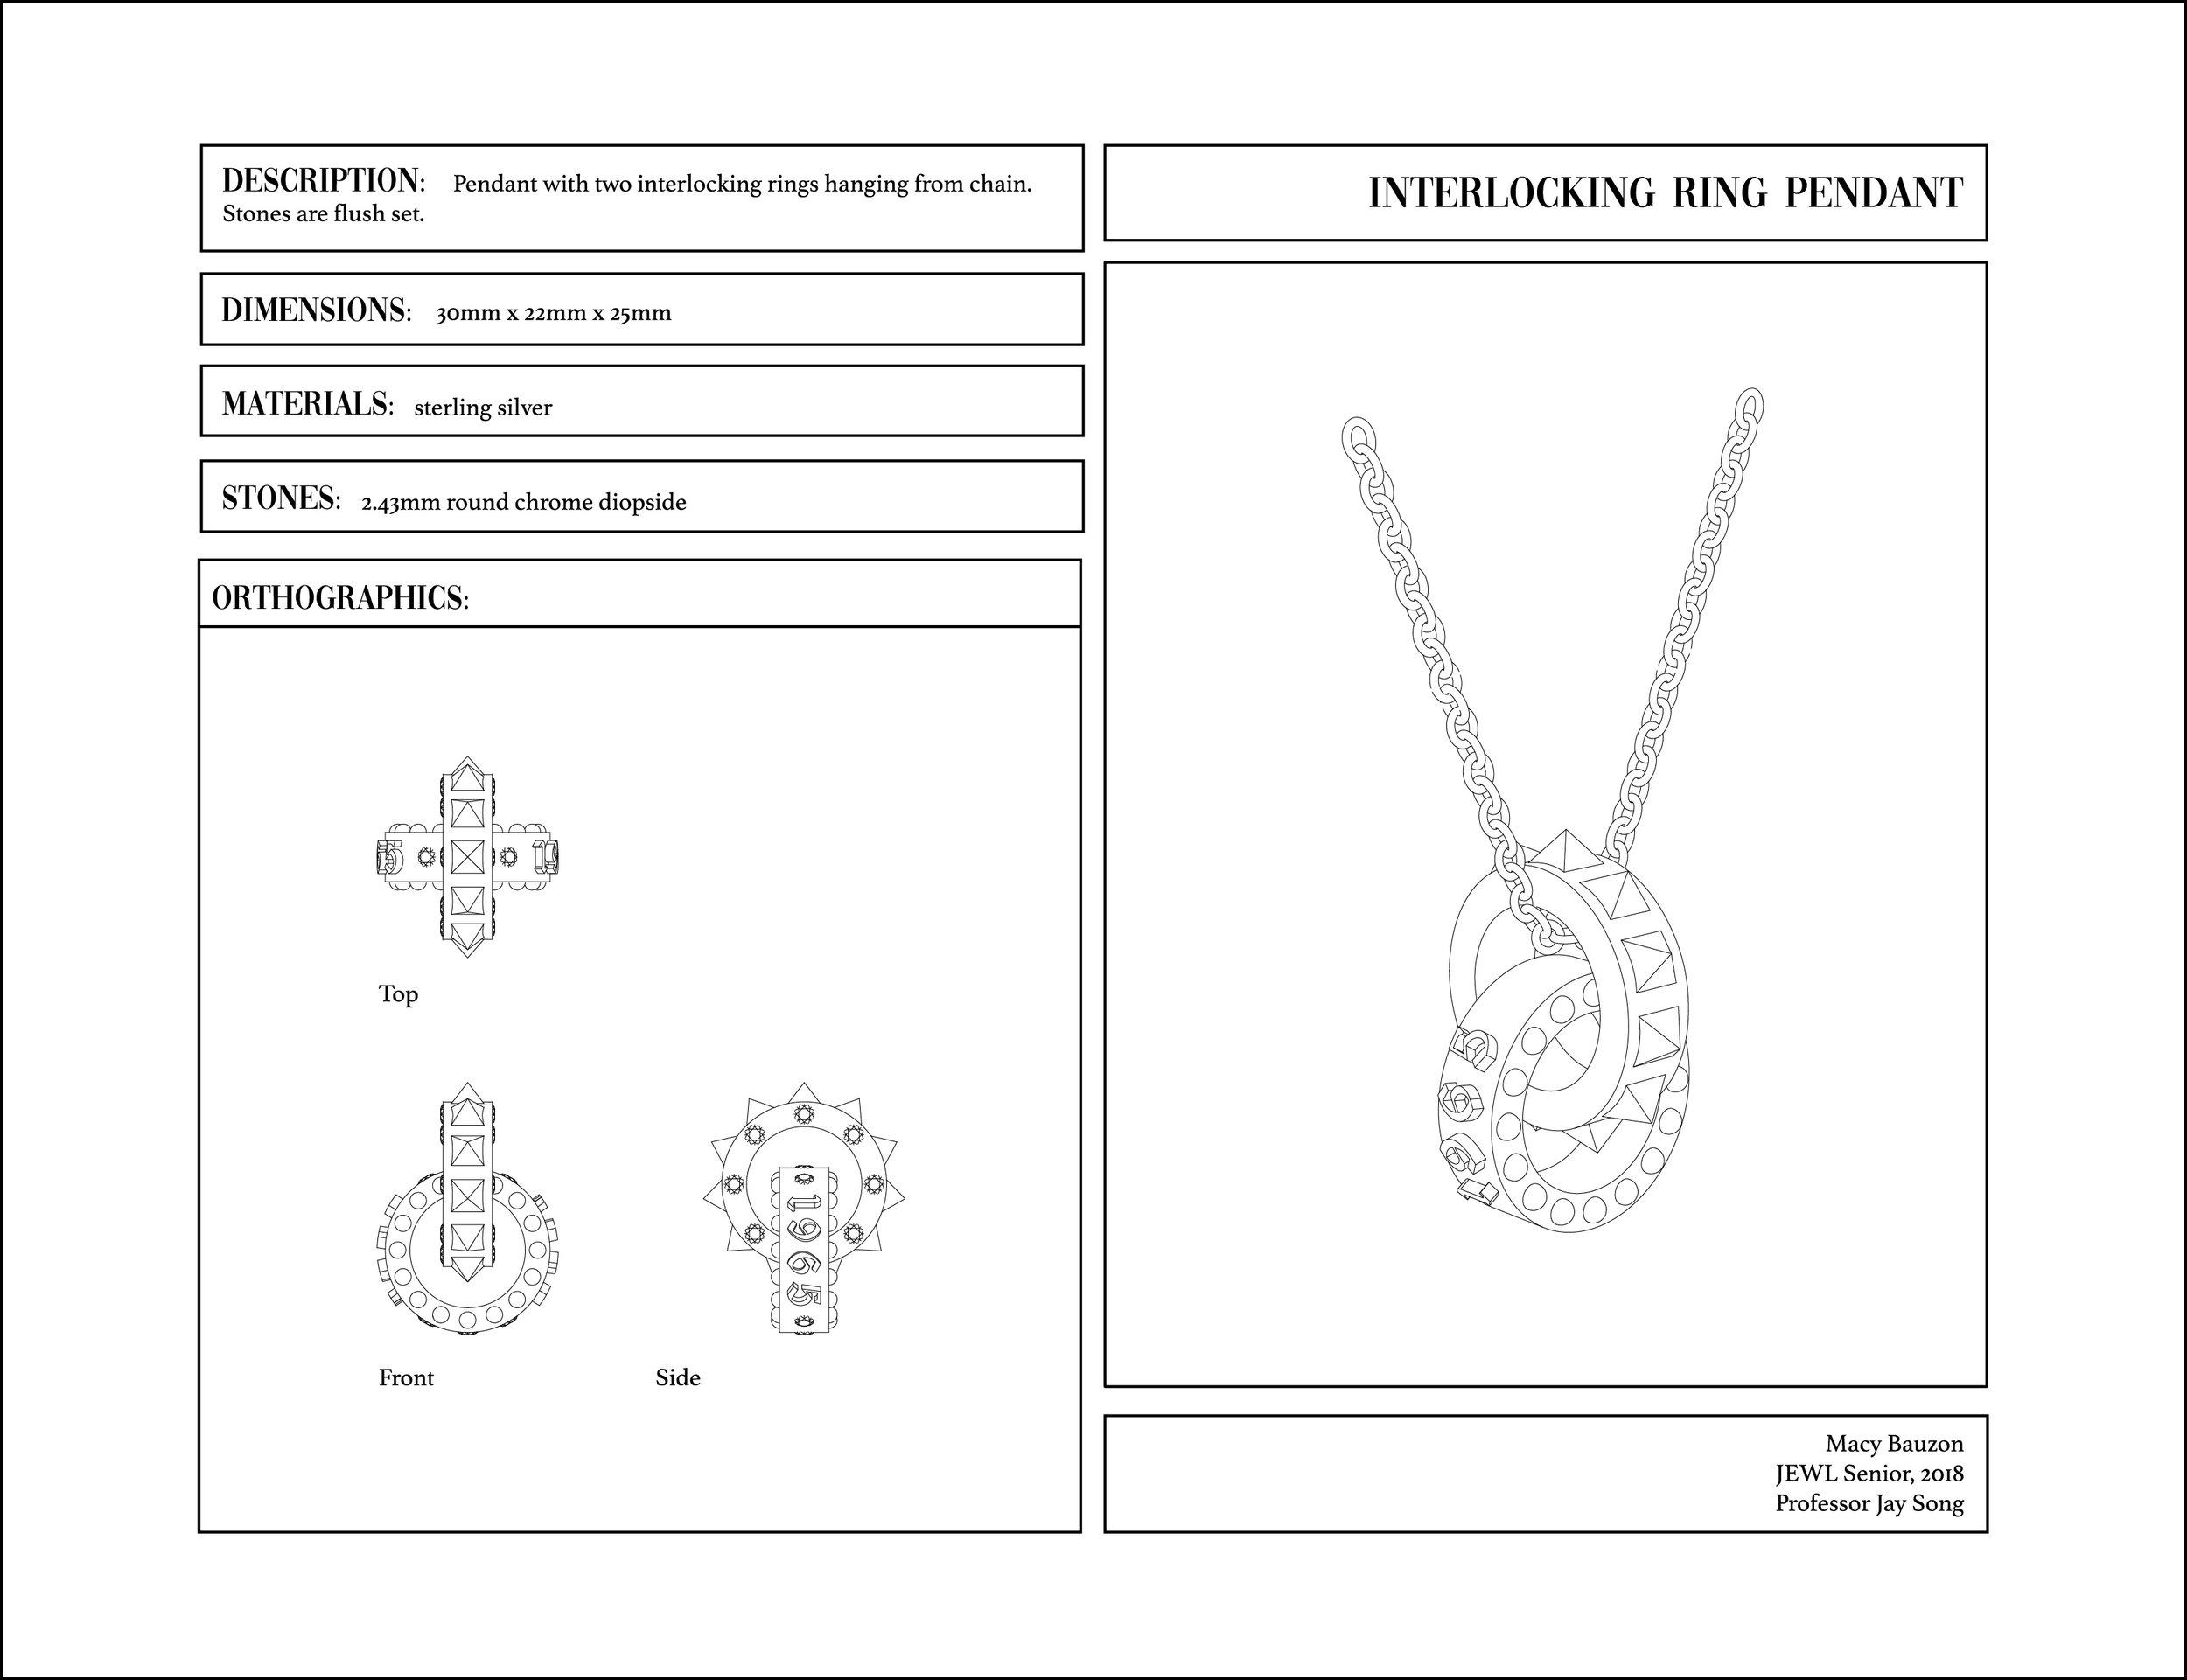 Interlocking Ring Pendant.jpg